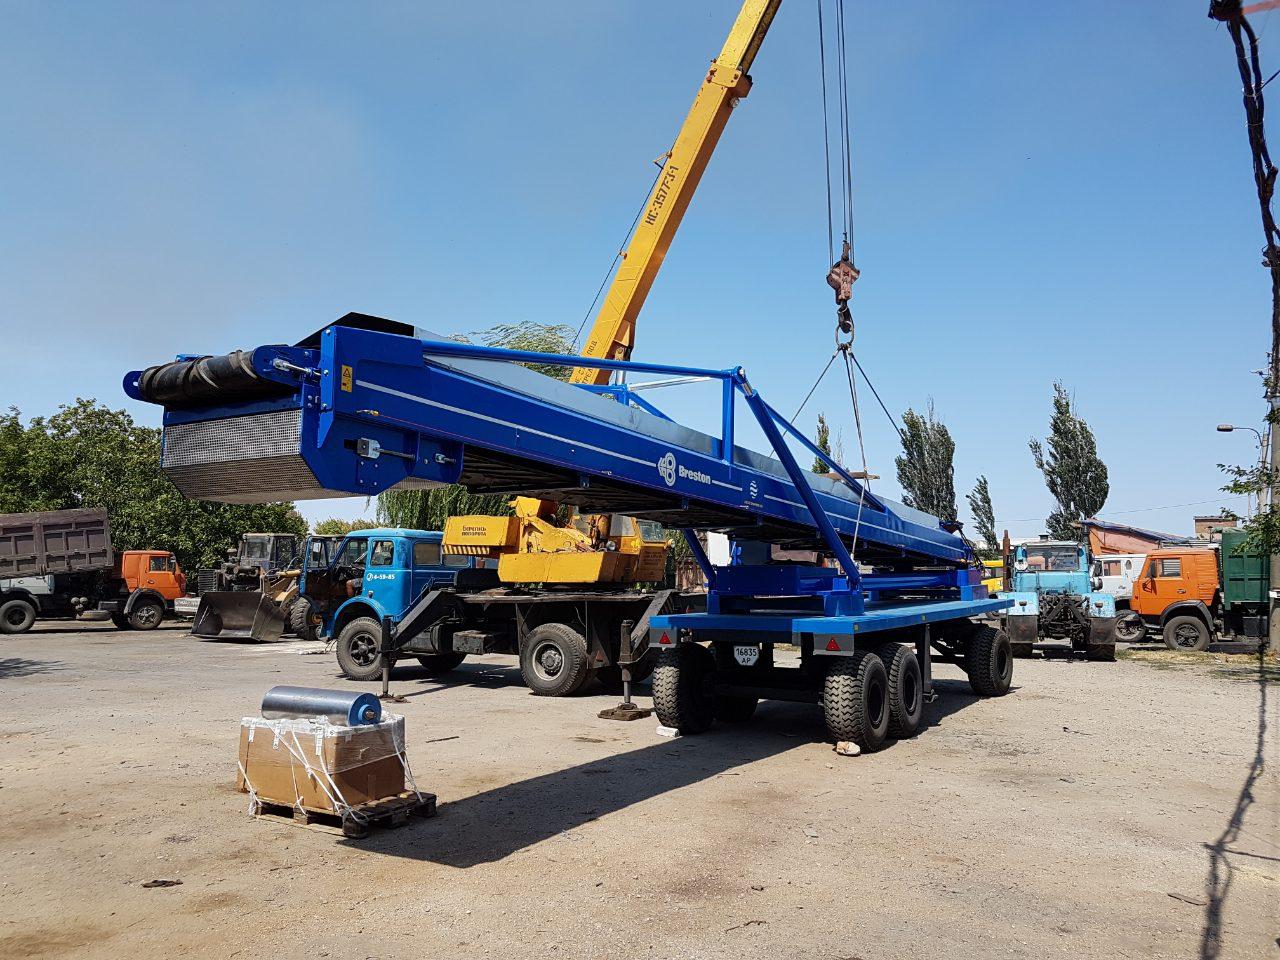 Перевозка оборудования для перевалки сыпучих грузов, фото-2